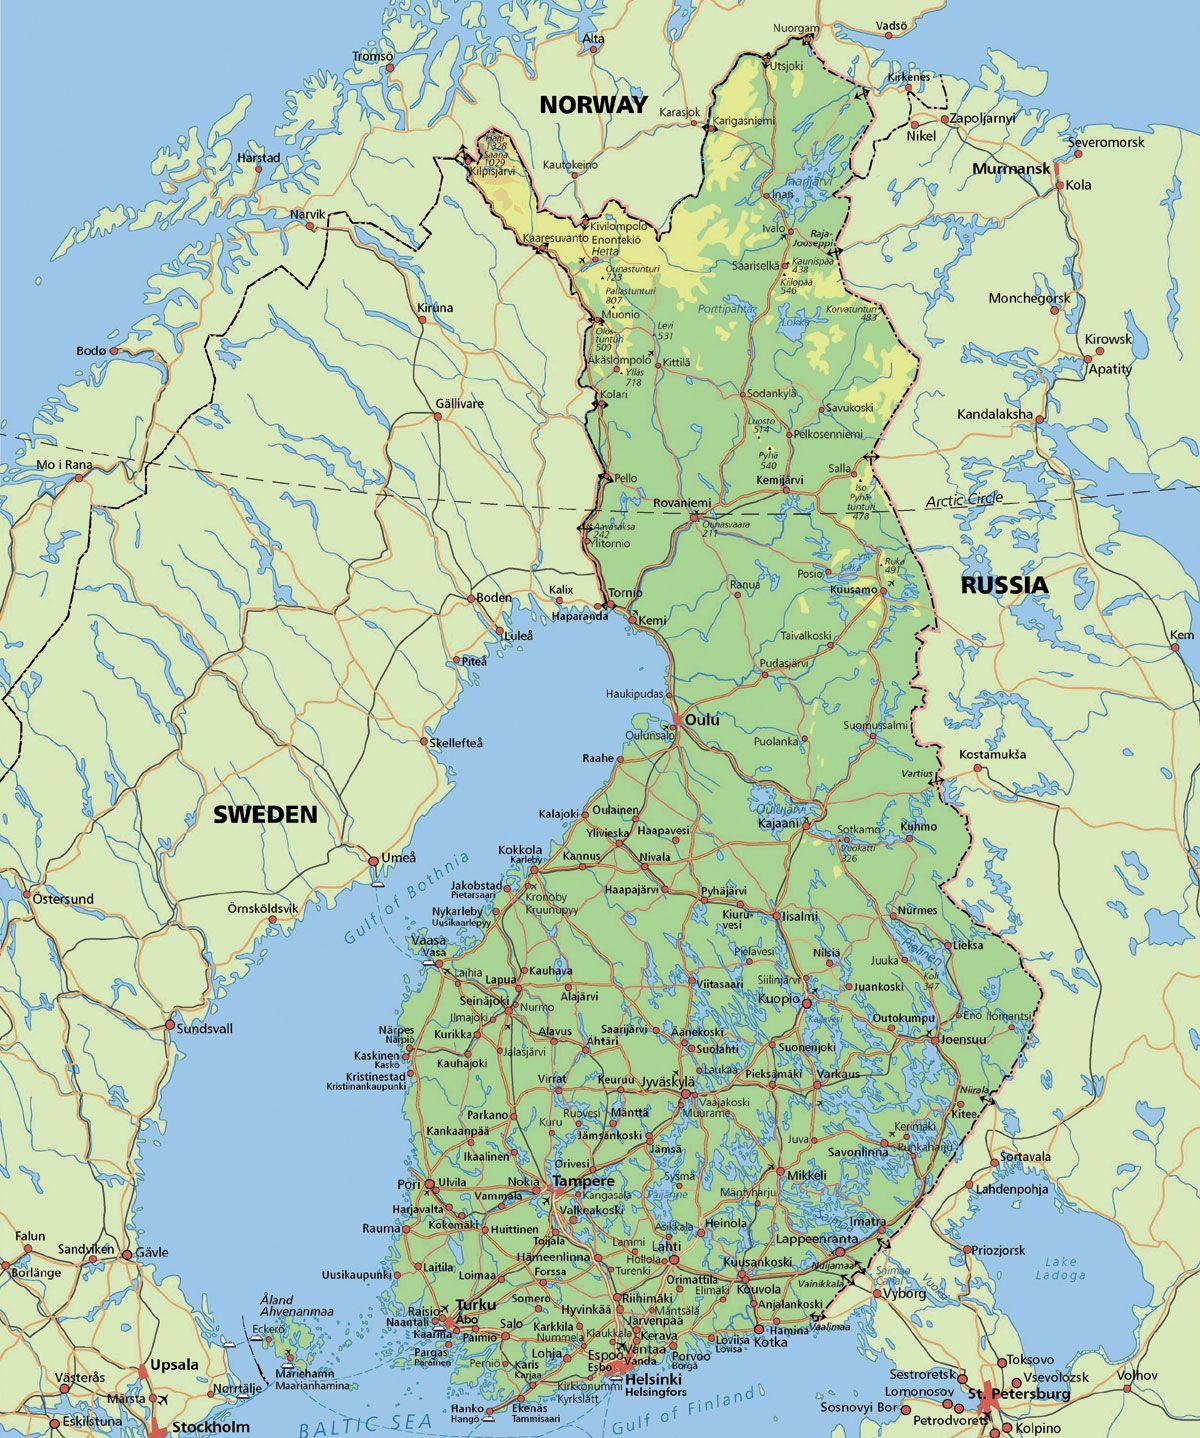 freezemapelevationcwg metersgif 14841114 DC Regional Maps